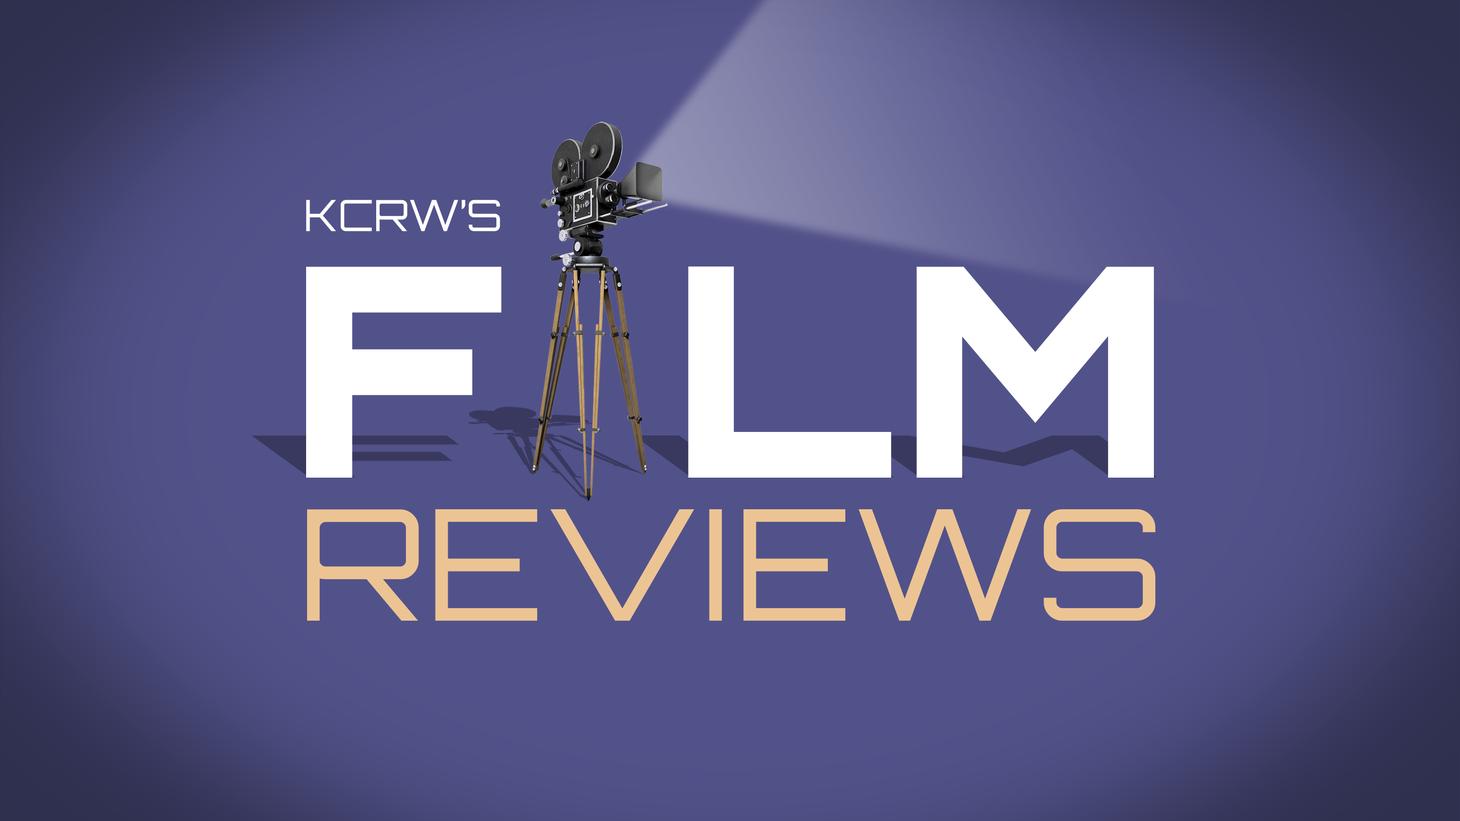 This week, Joe Morgenstern reviews Glory Road and Last Holiday.